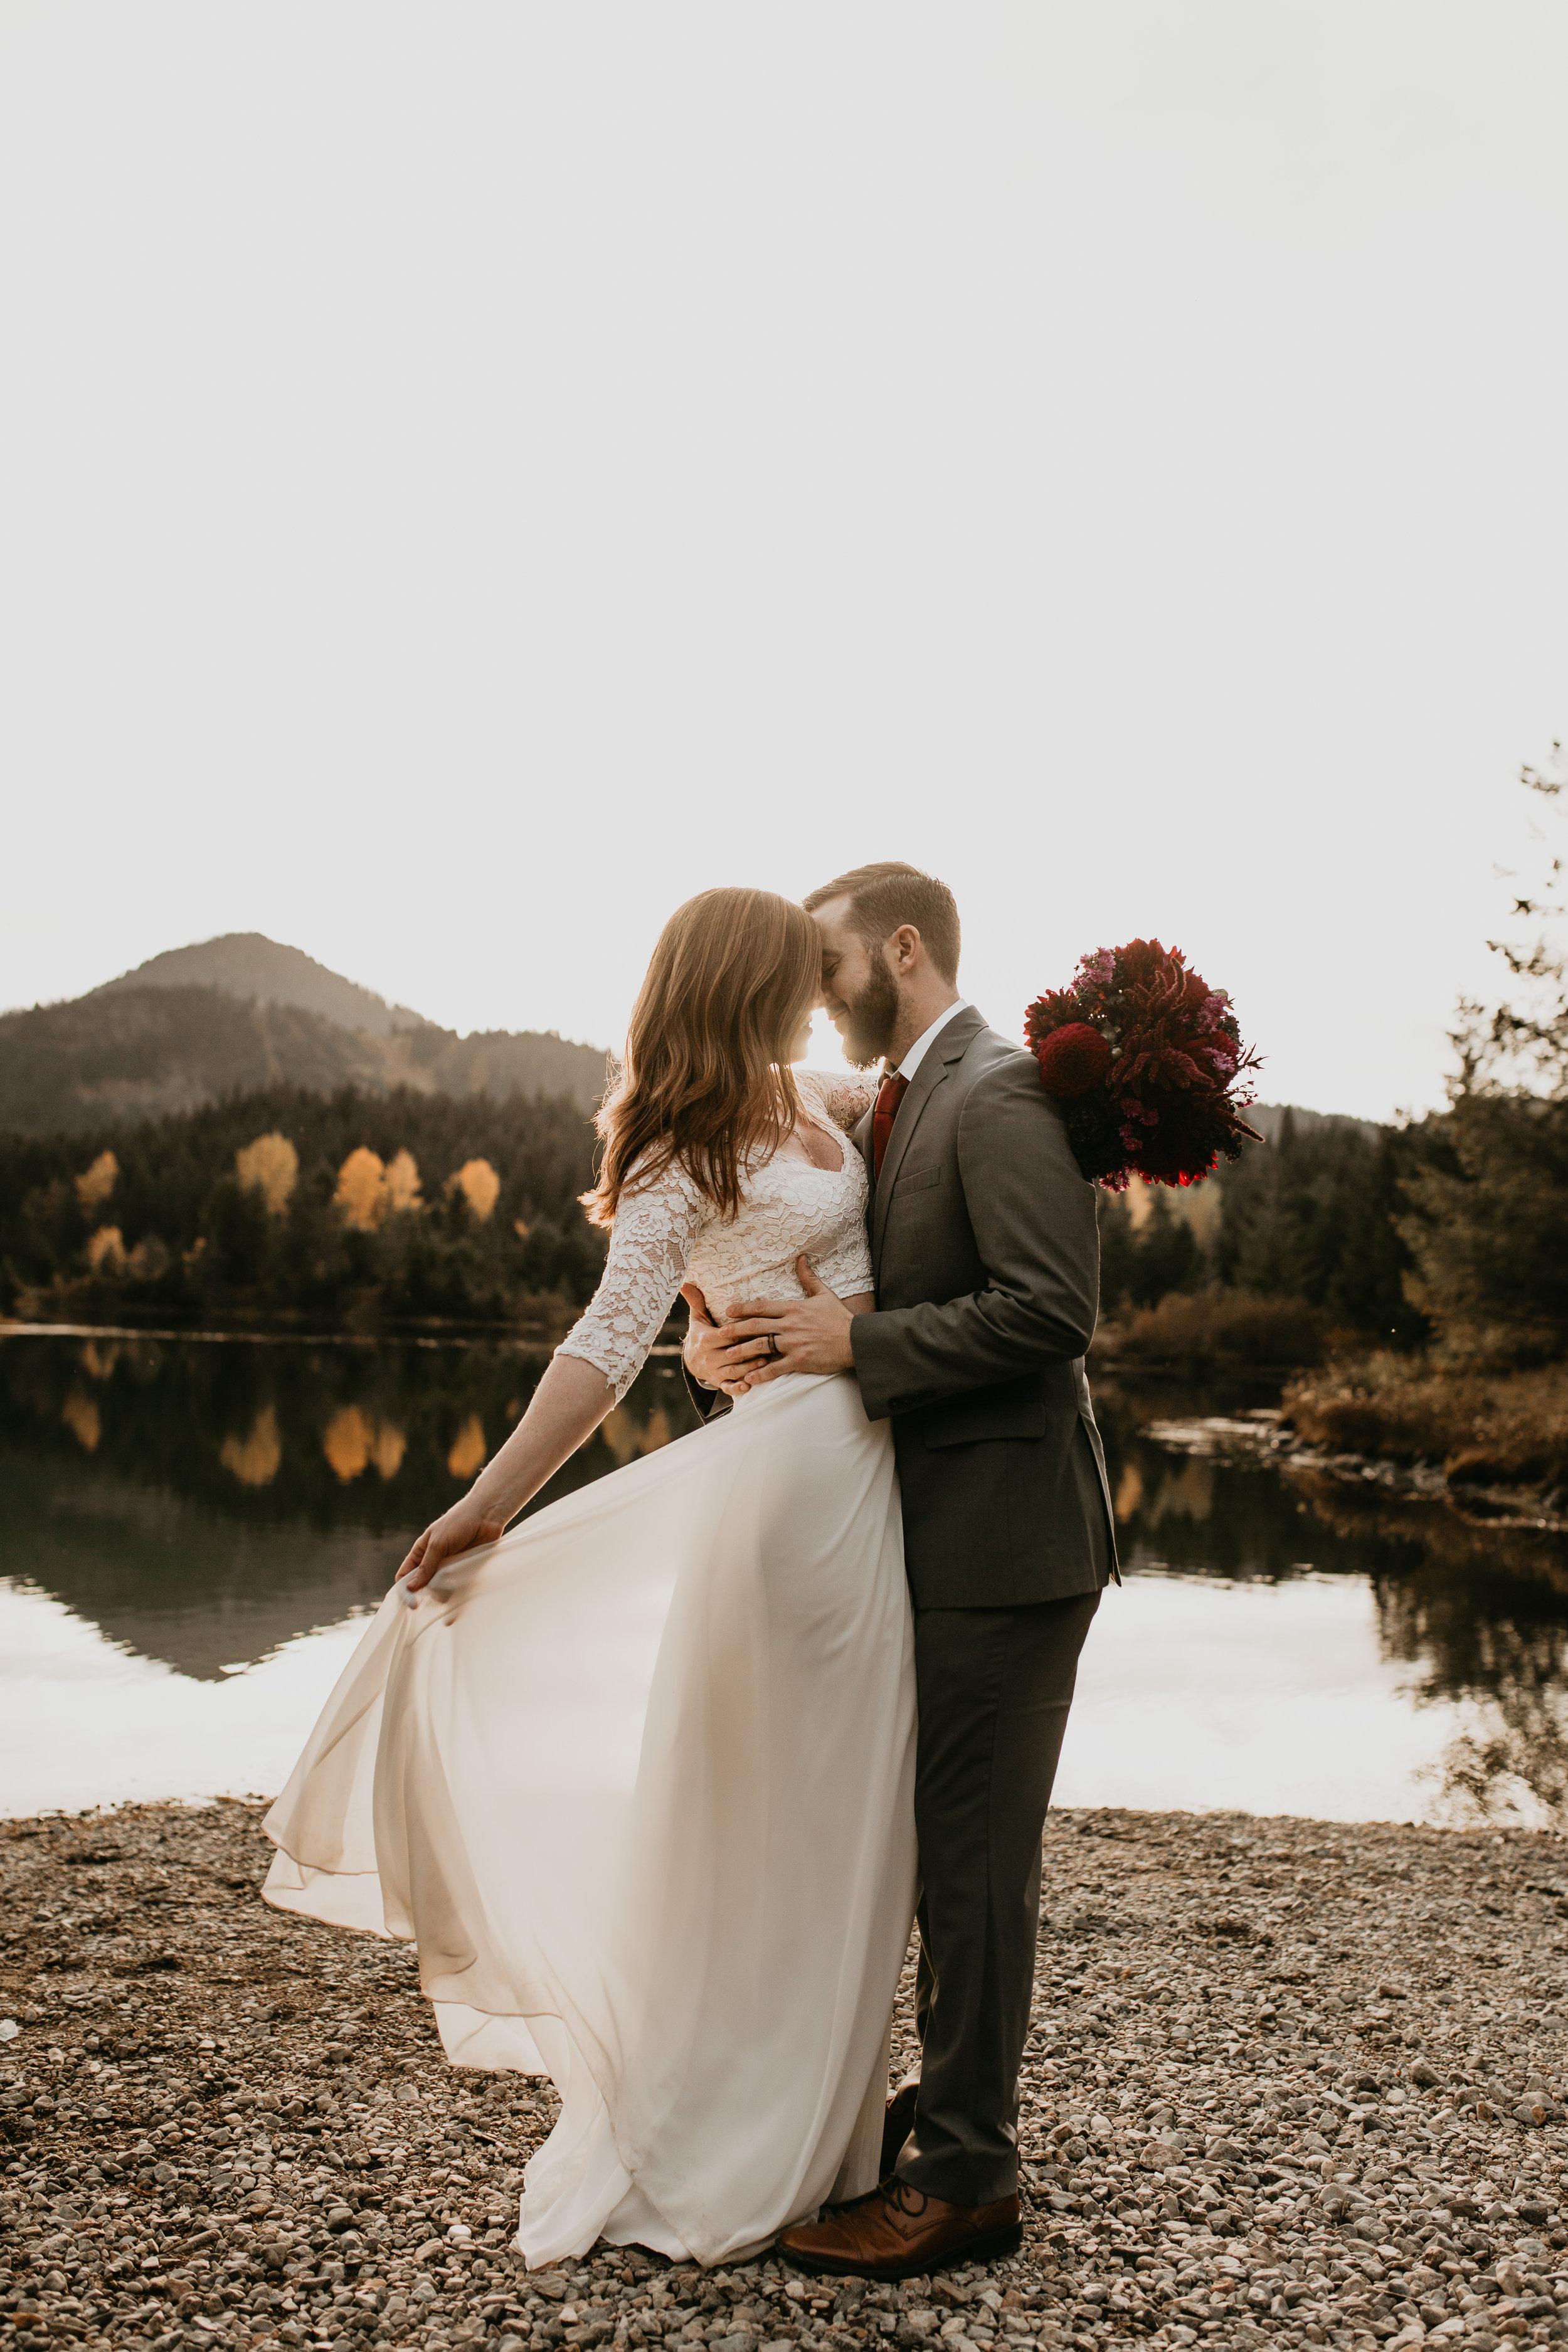 nicole-daacke-photography-mountain-view-elopement-at-gold-creek-pond-snoqualmie-washington-wa-elopement-photographer-photography-adventure-elopement-in-washington-fall-lakeside-golden-sunset-boho-fun-bride-0344.jpg